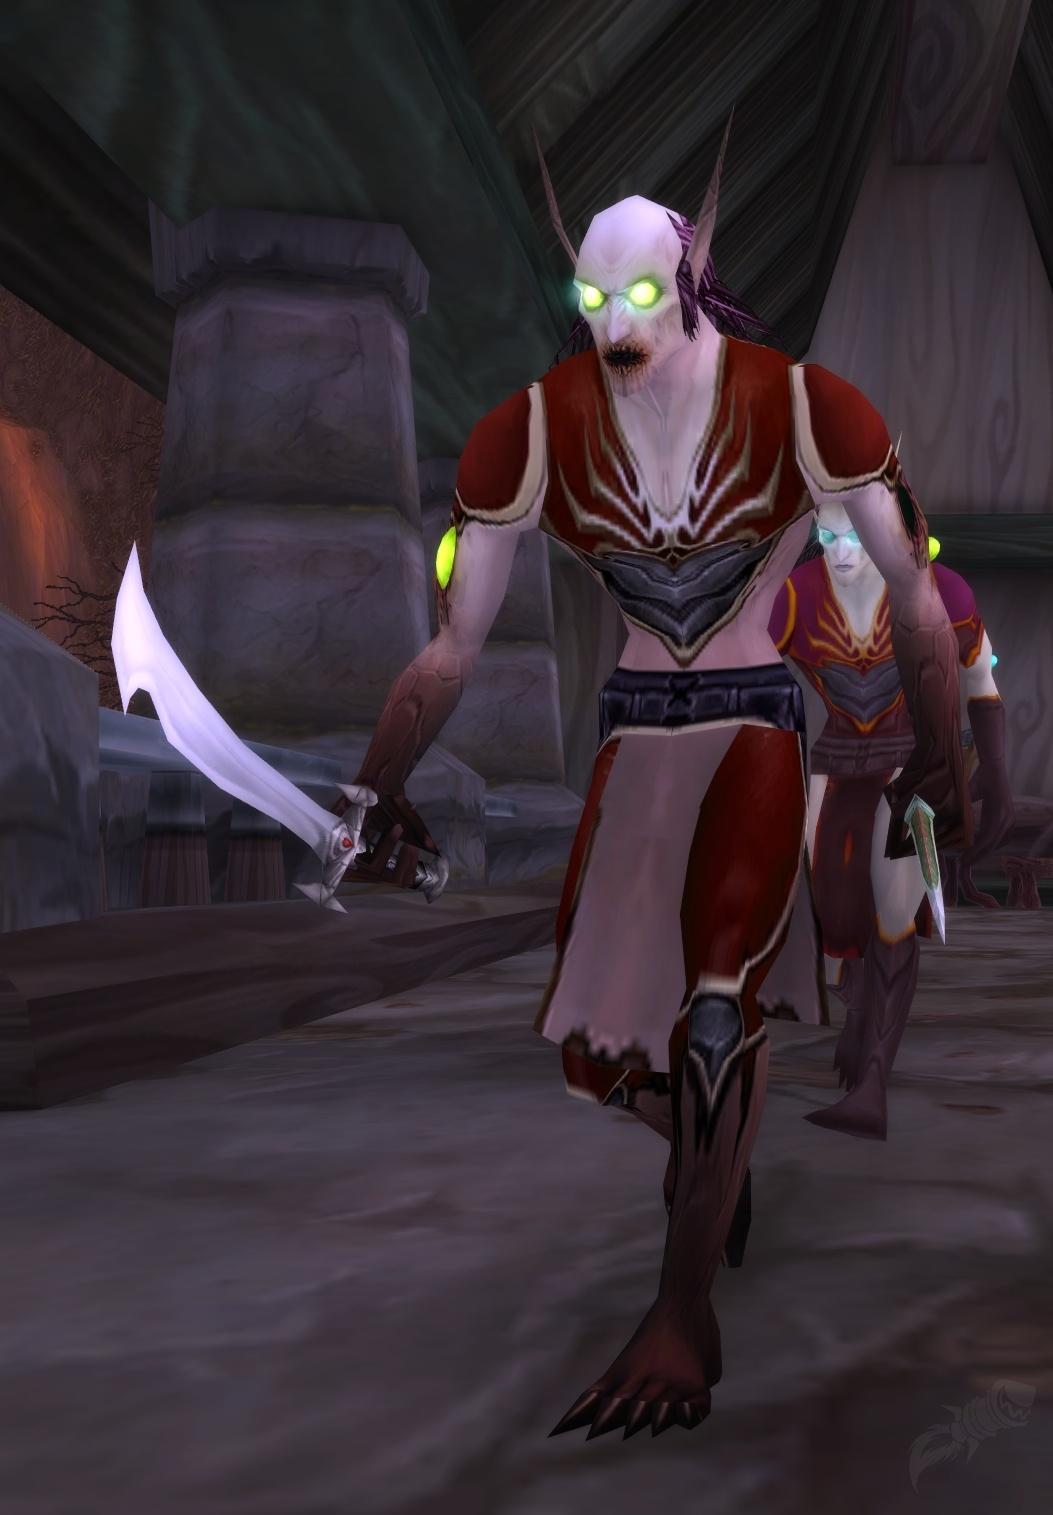 Pfadwanderer Of Npc Getriebener World Warcraft Nnv0m8w